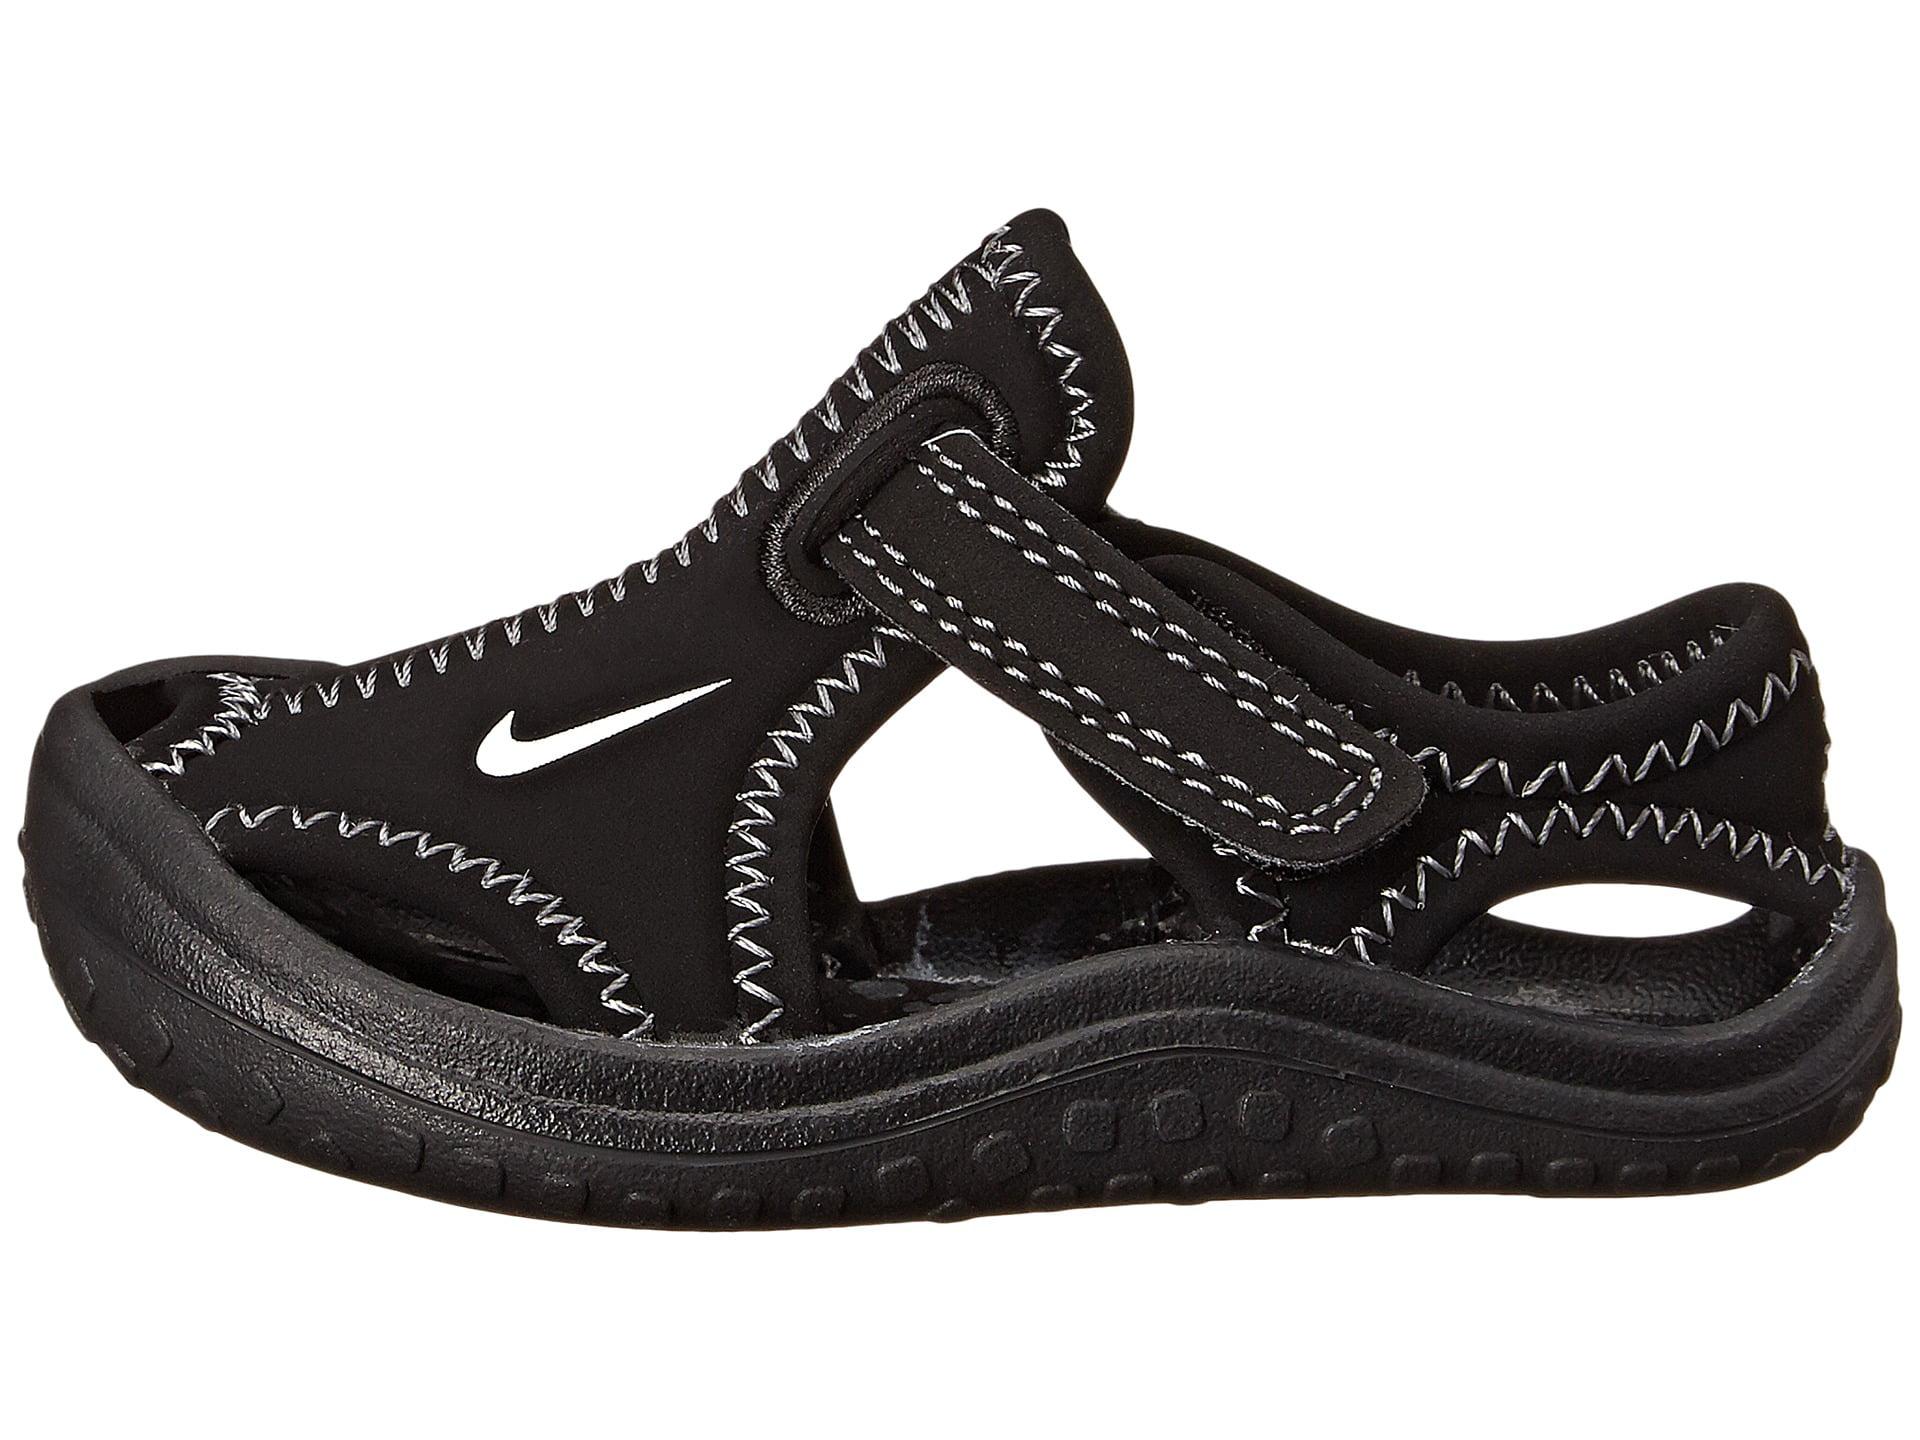 38a0c7d4e ... coupon code for nike kids sunray protect sandal black white dark grey  7c walmart 9f872 e9f65